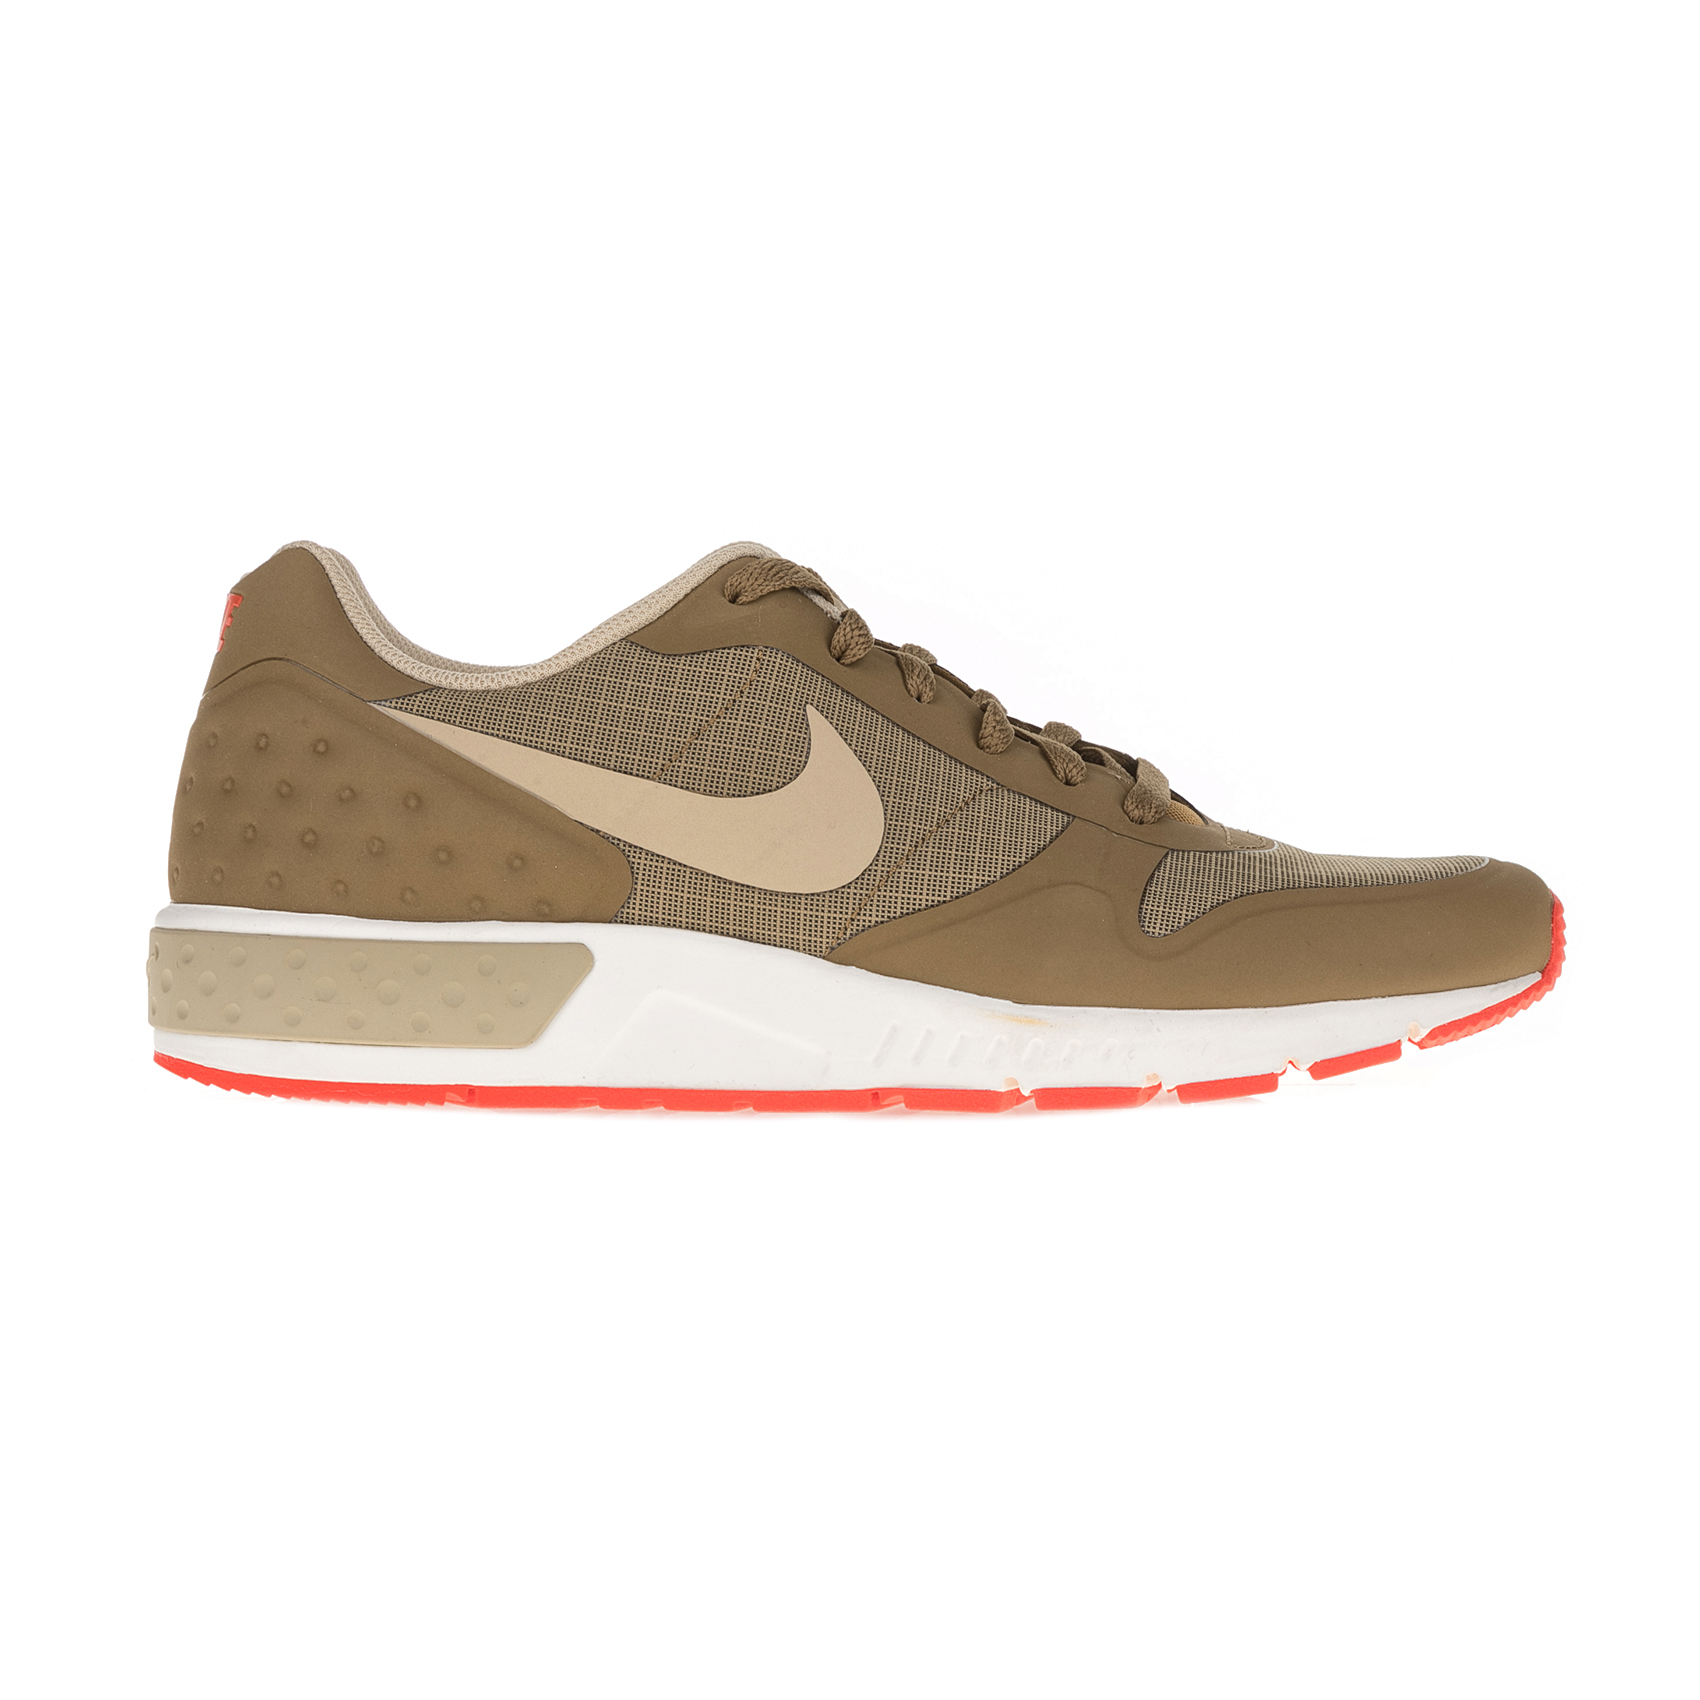 NIKE – Ανδρικά αθλητικά παπούτσια Nike NIGHTGAZER LW καφέ